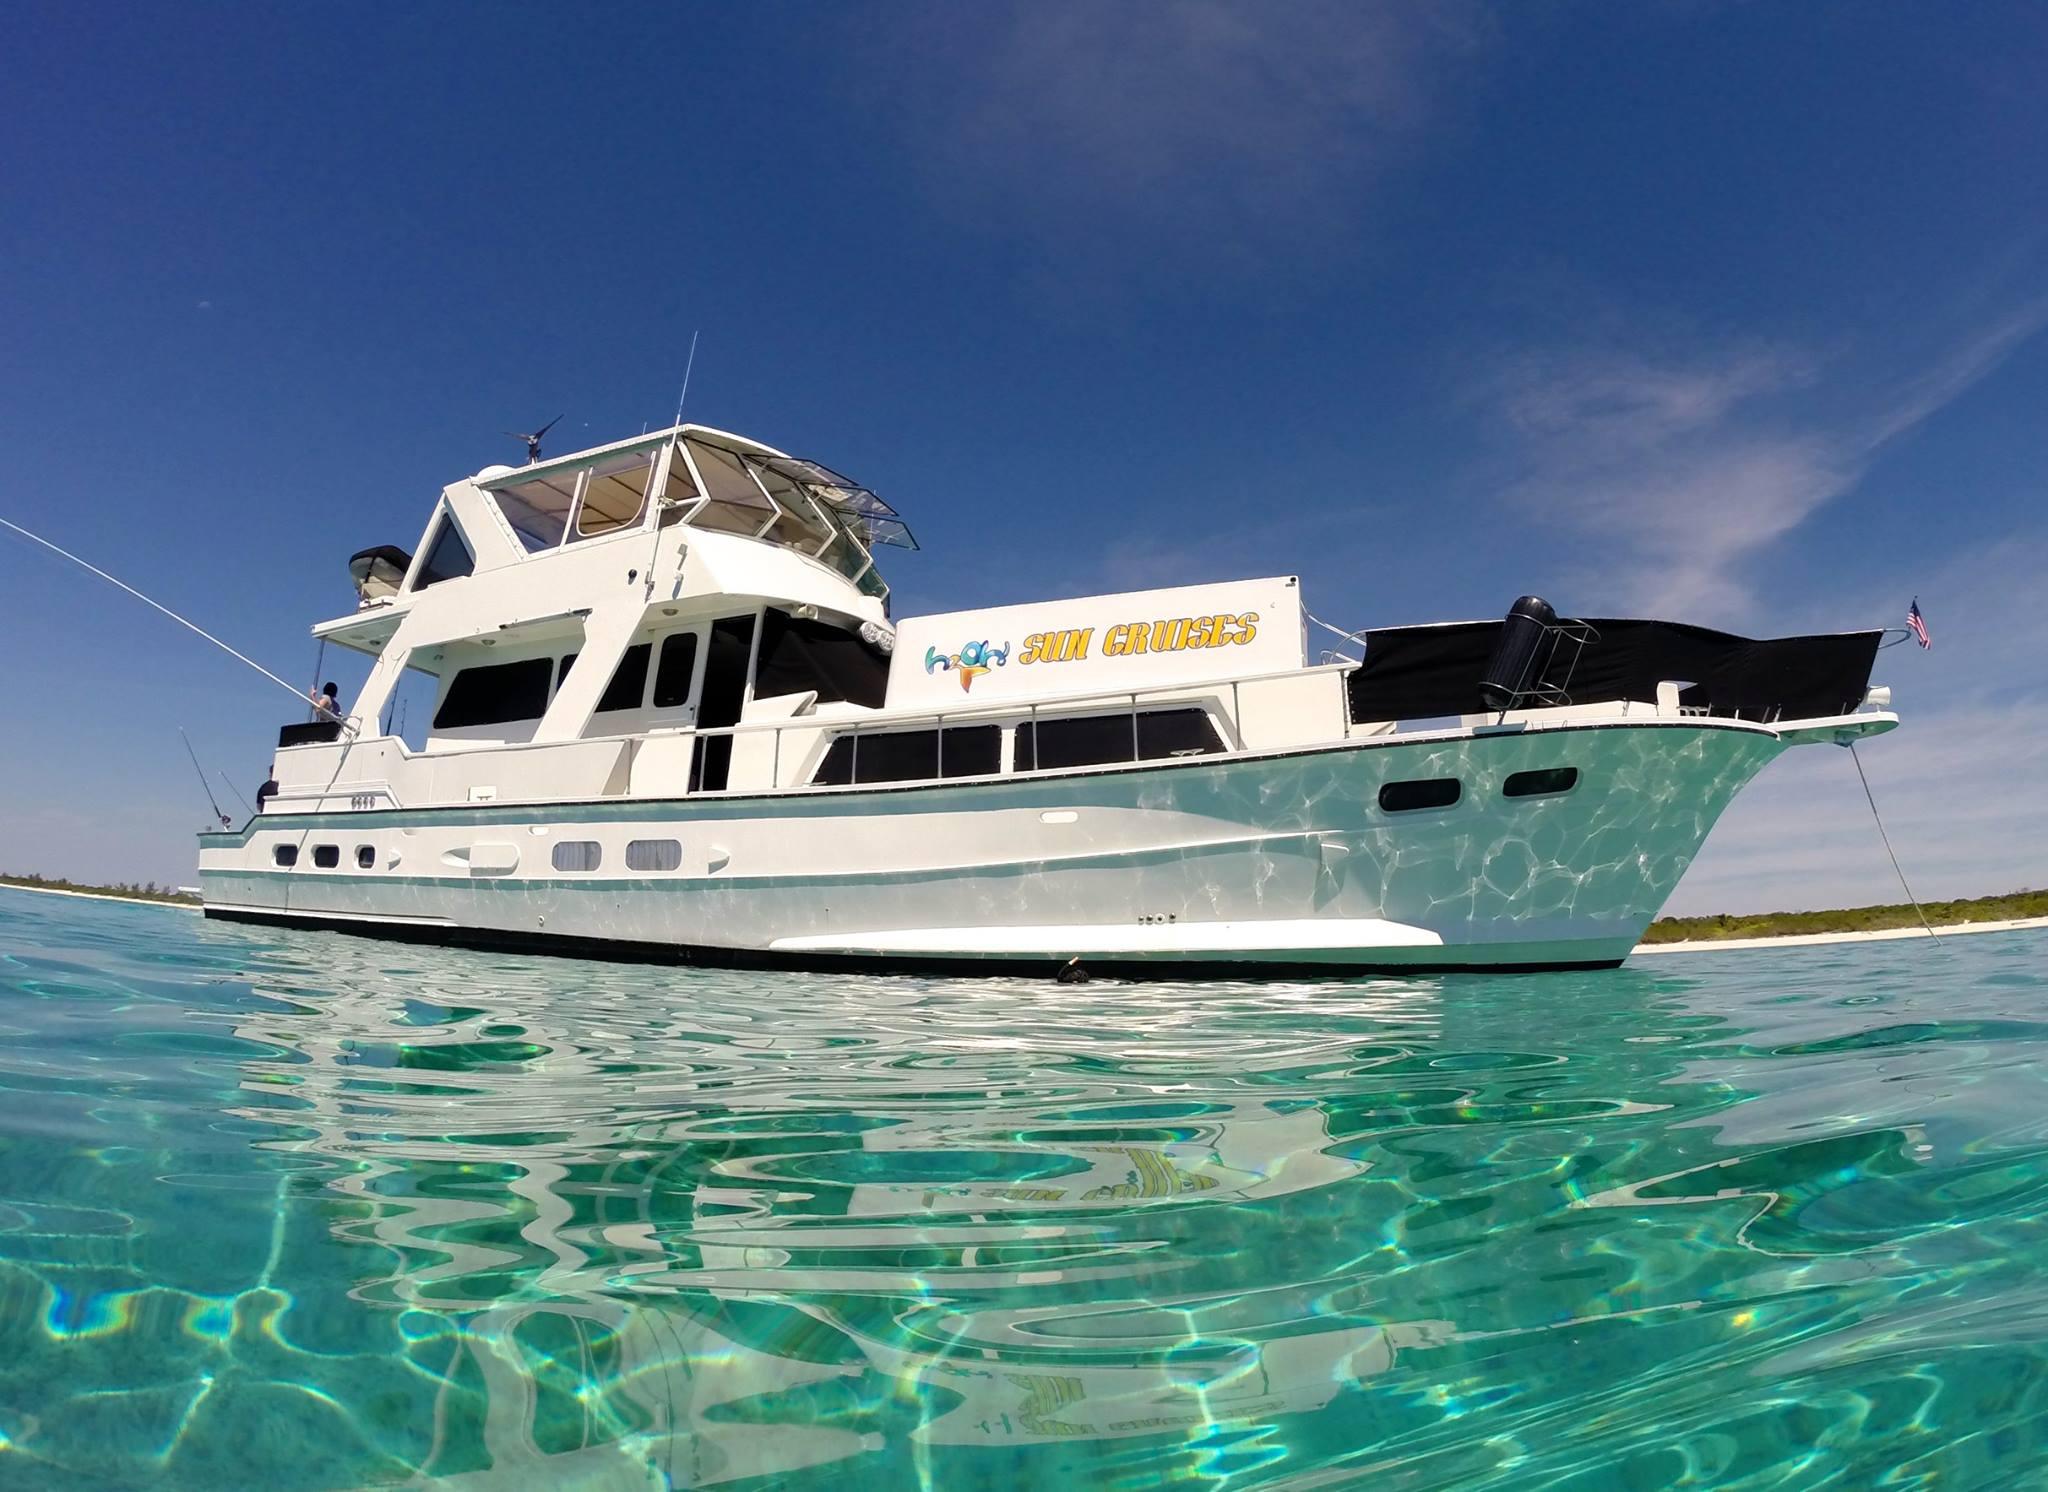 The 72' yacht, Piratas de Tejas of h2oh Sun Cruises.